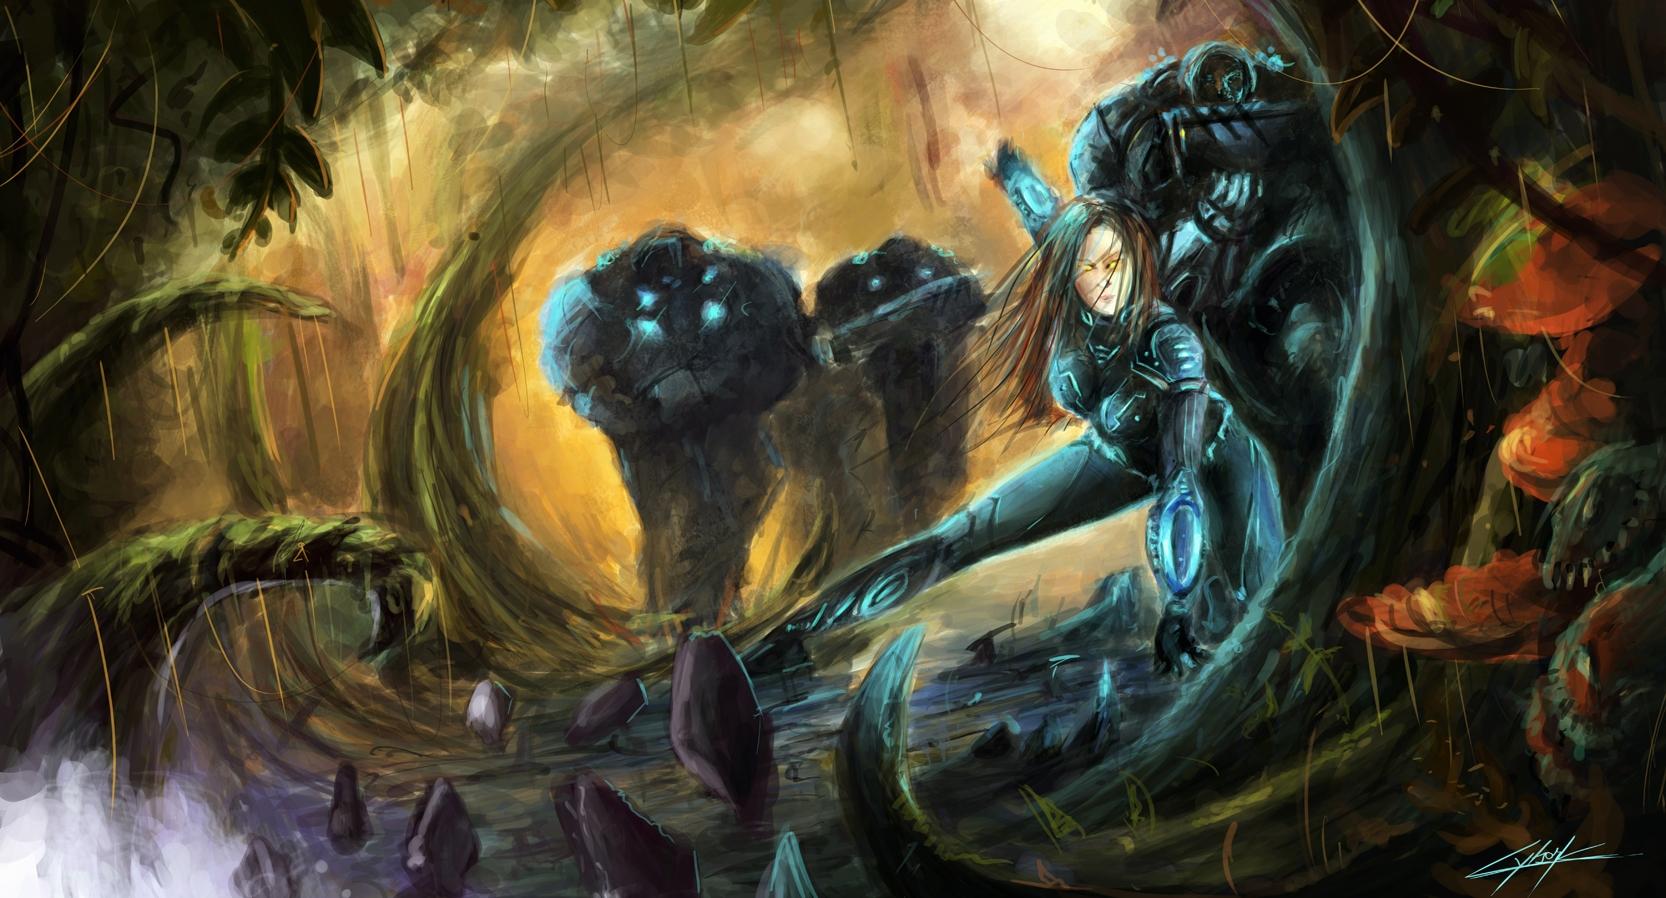 Starcraft 2 Heart of the Swarm jungle by VitoSs